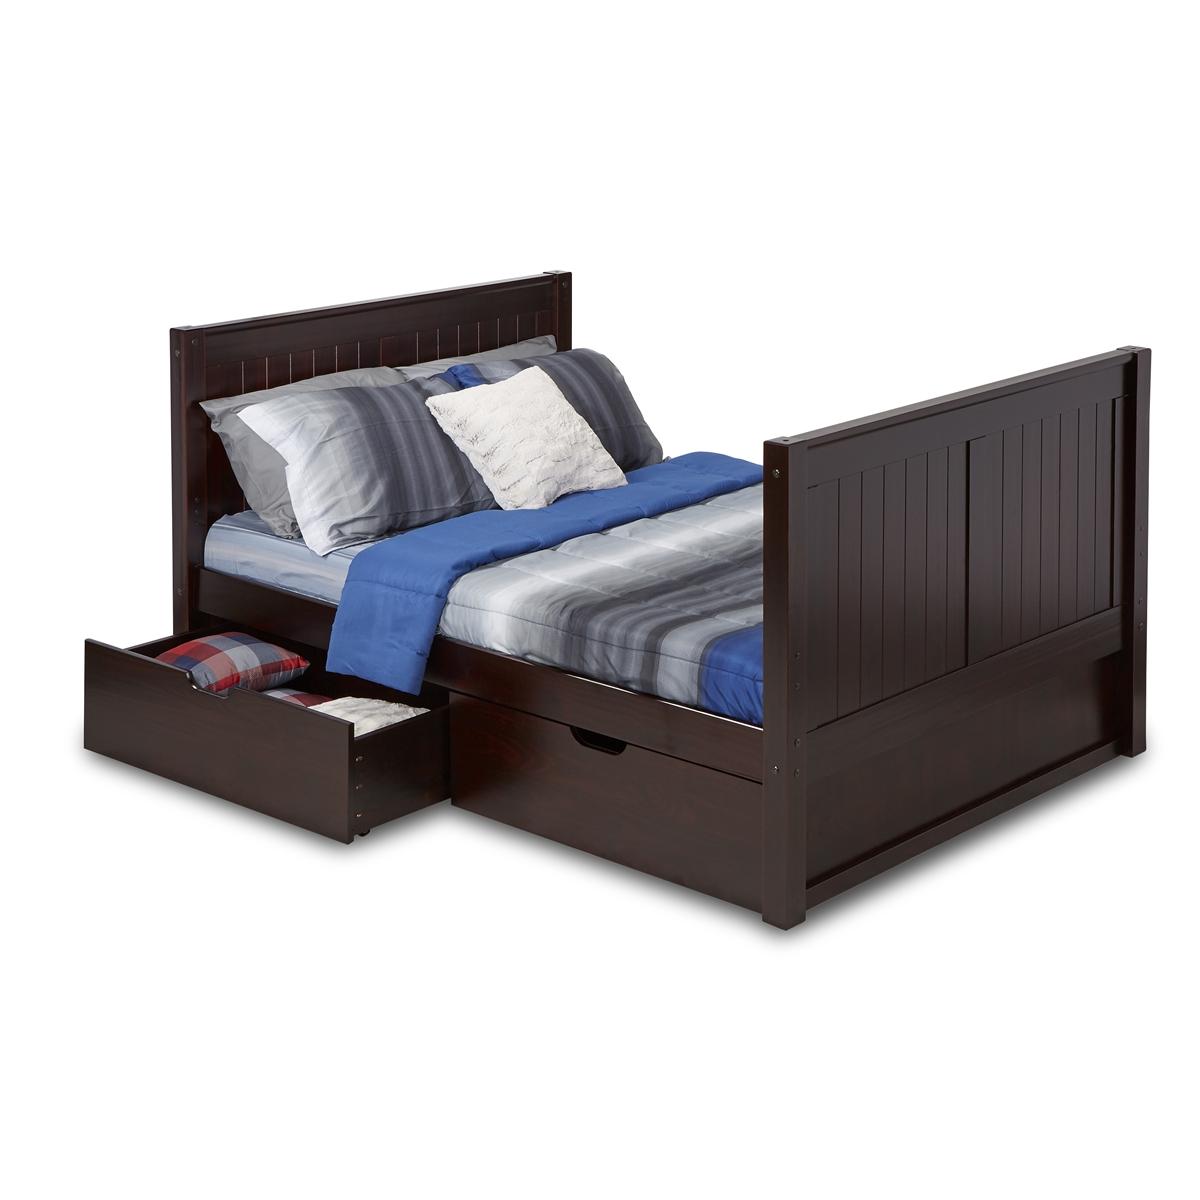 Full Size Platform Bed Tall Drawers Panel Black